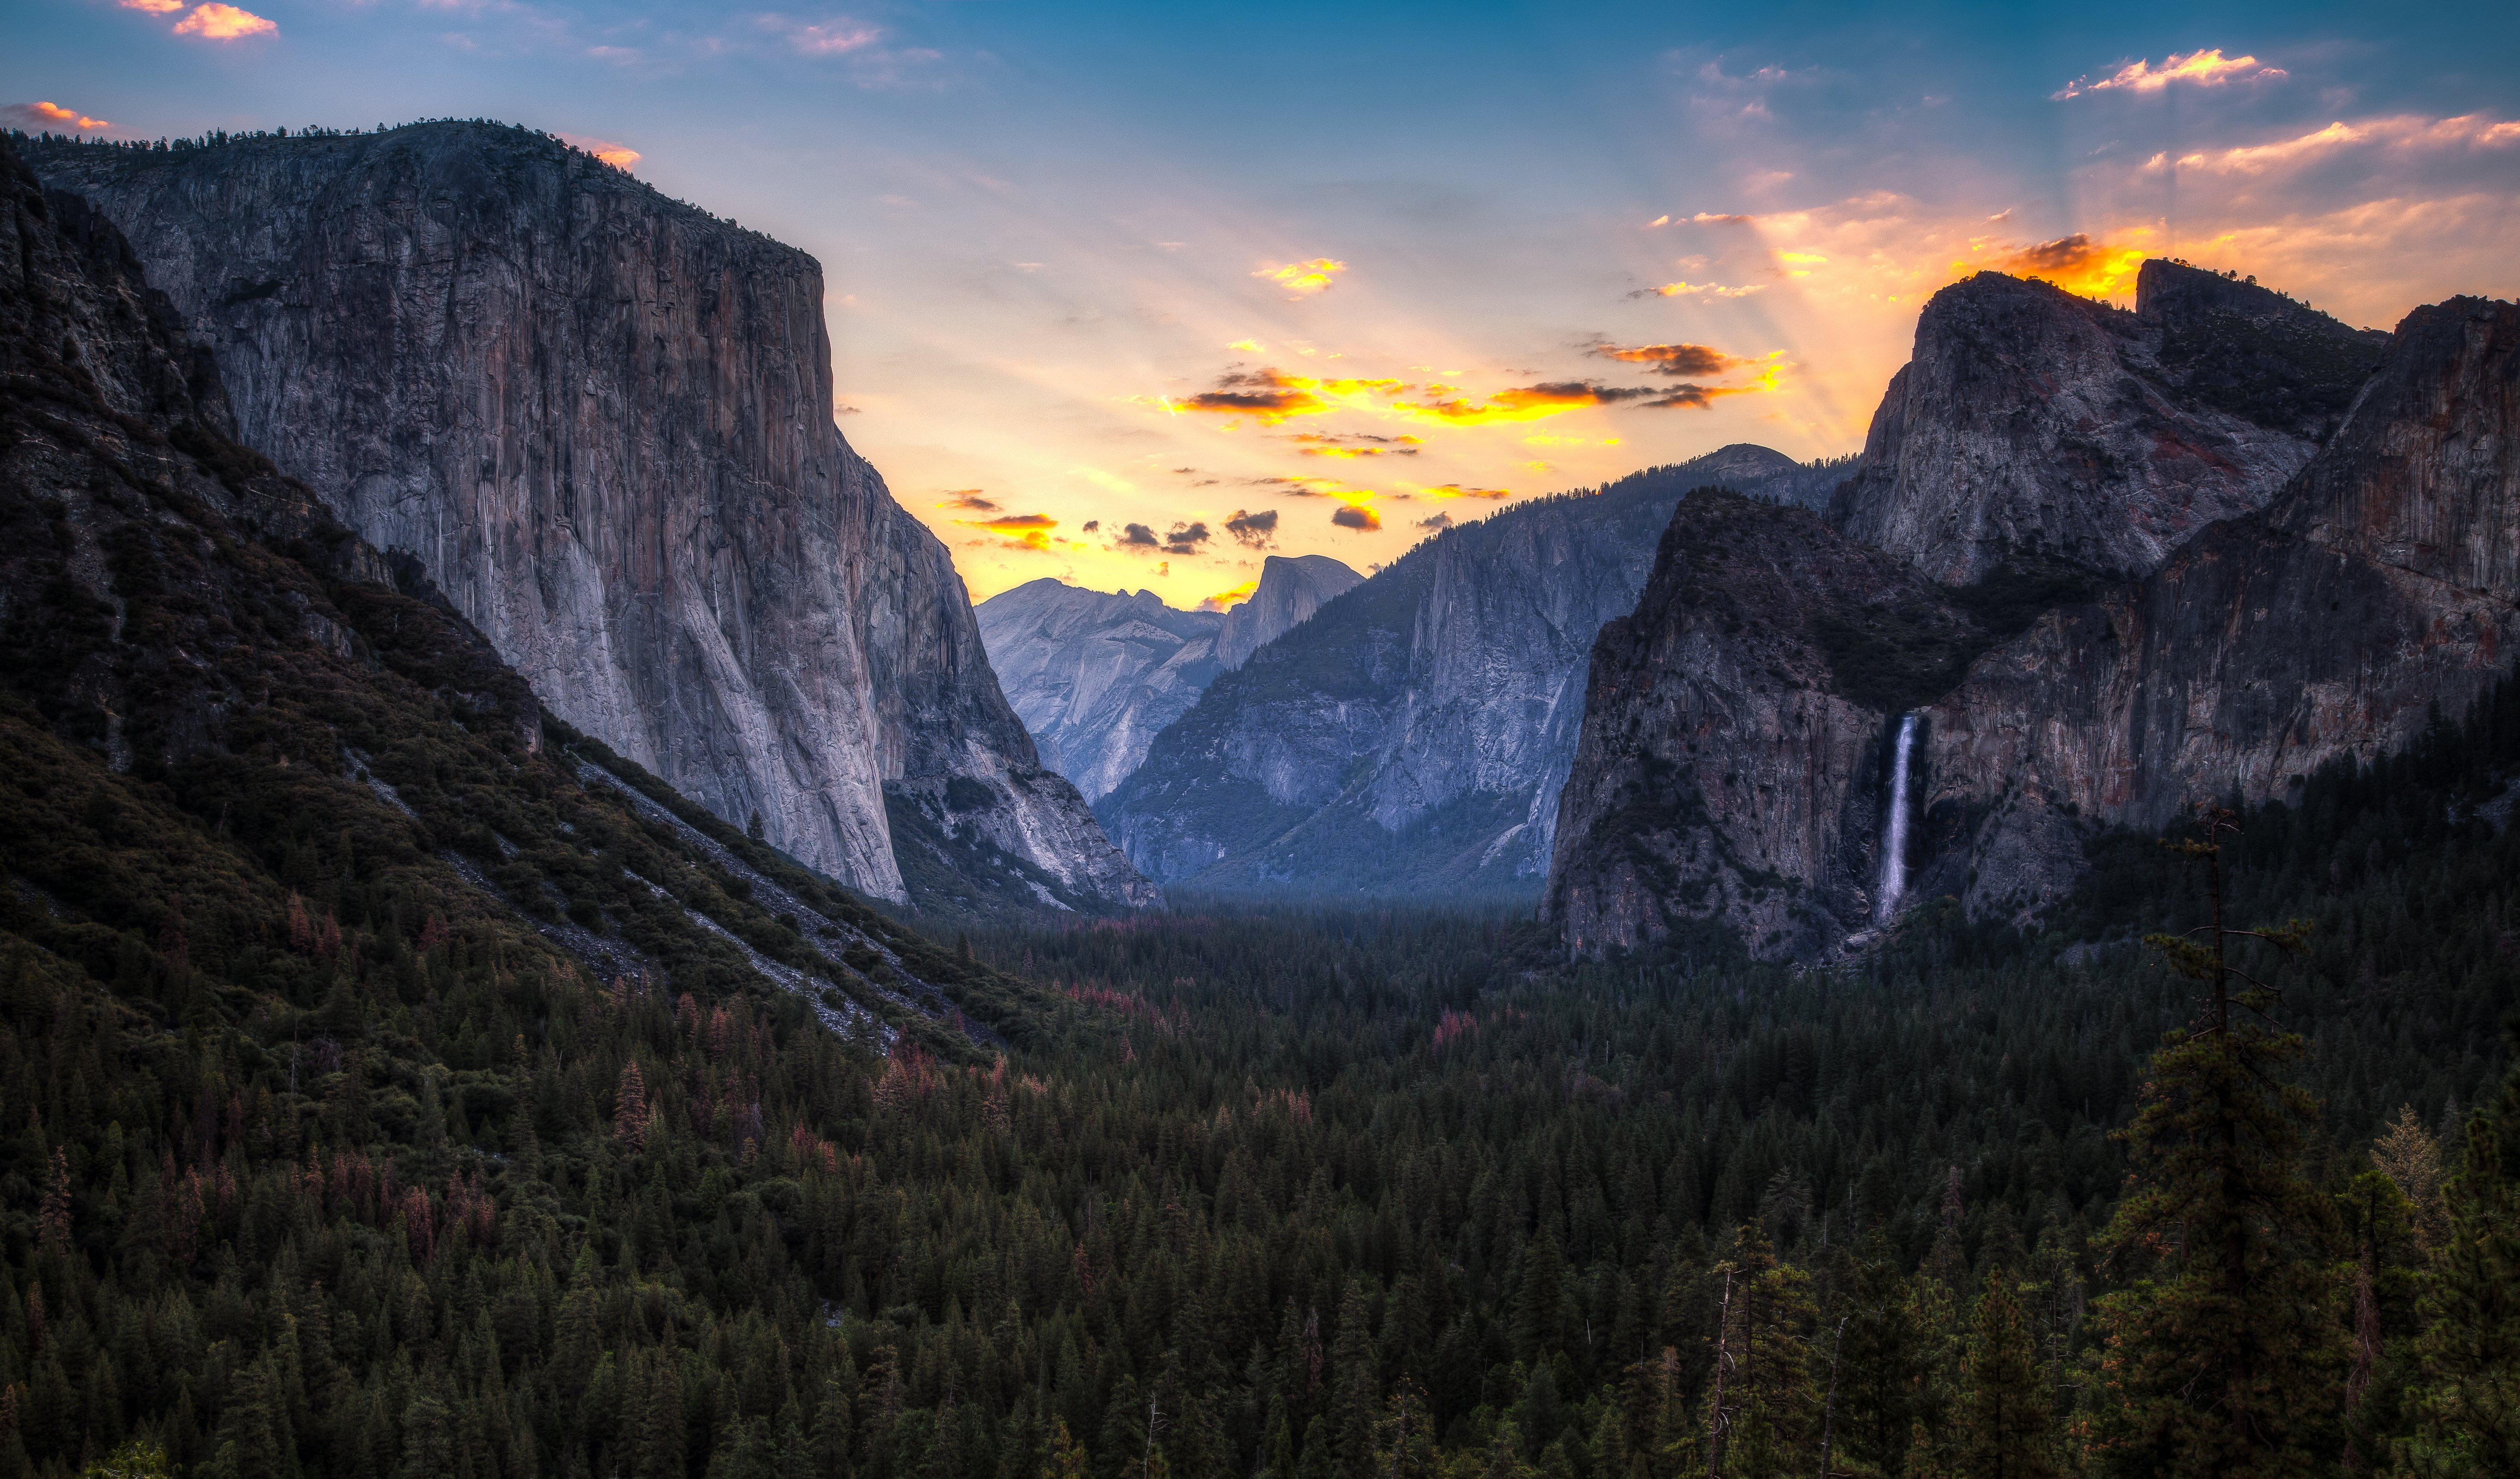 Sunrise on Yosemite Valley Yosemite National Park California wallpaper